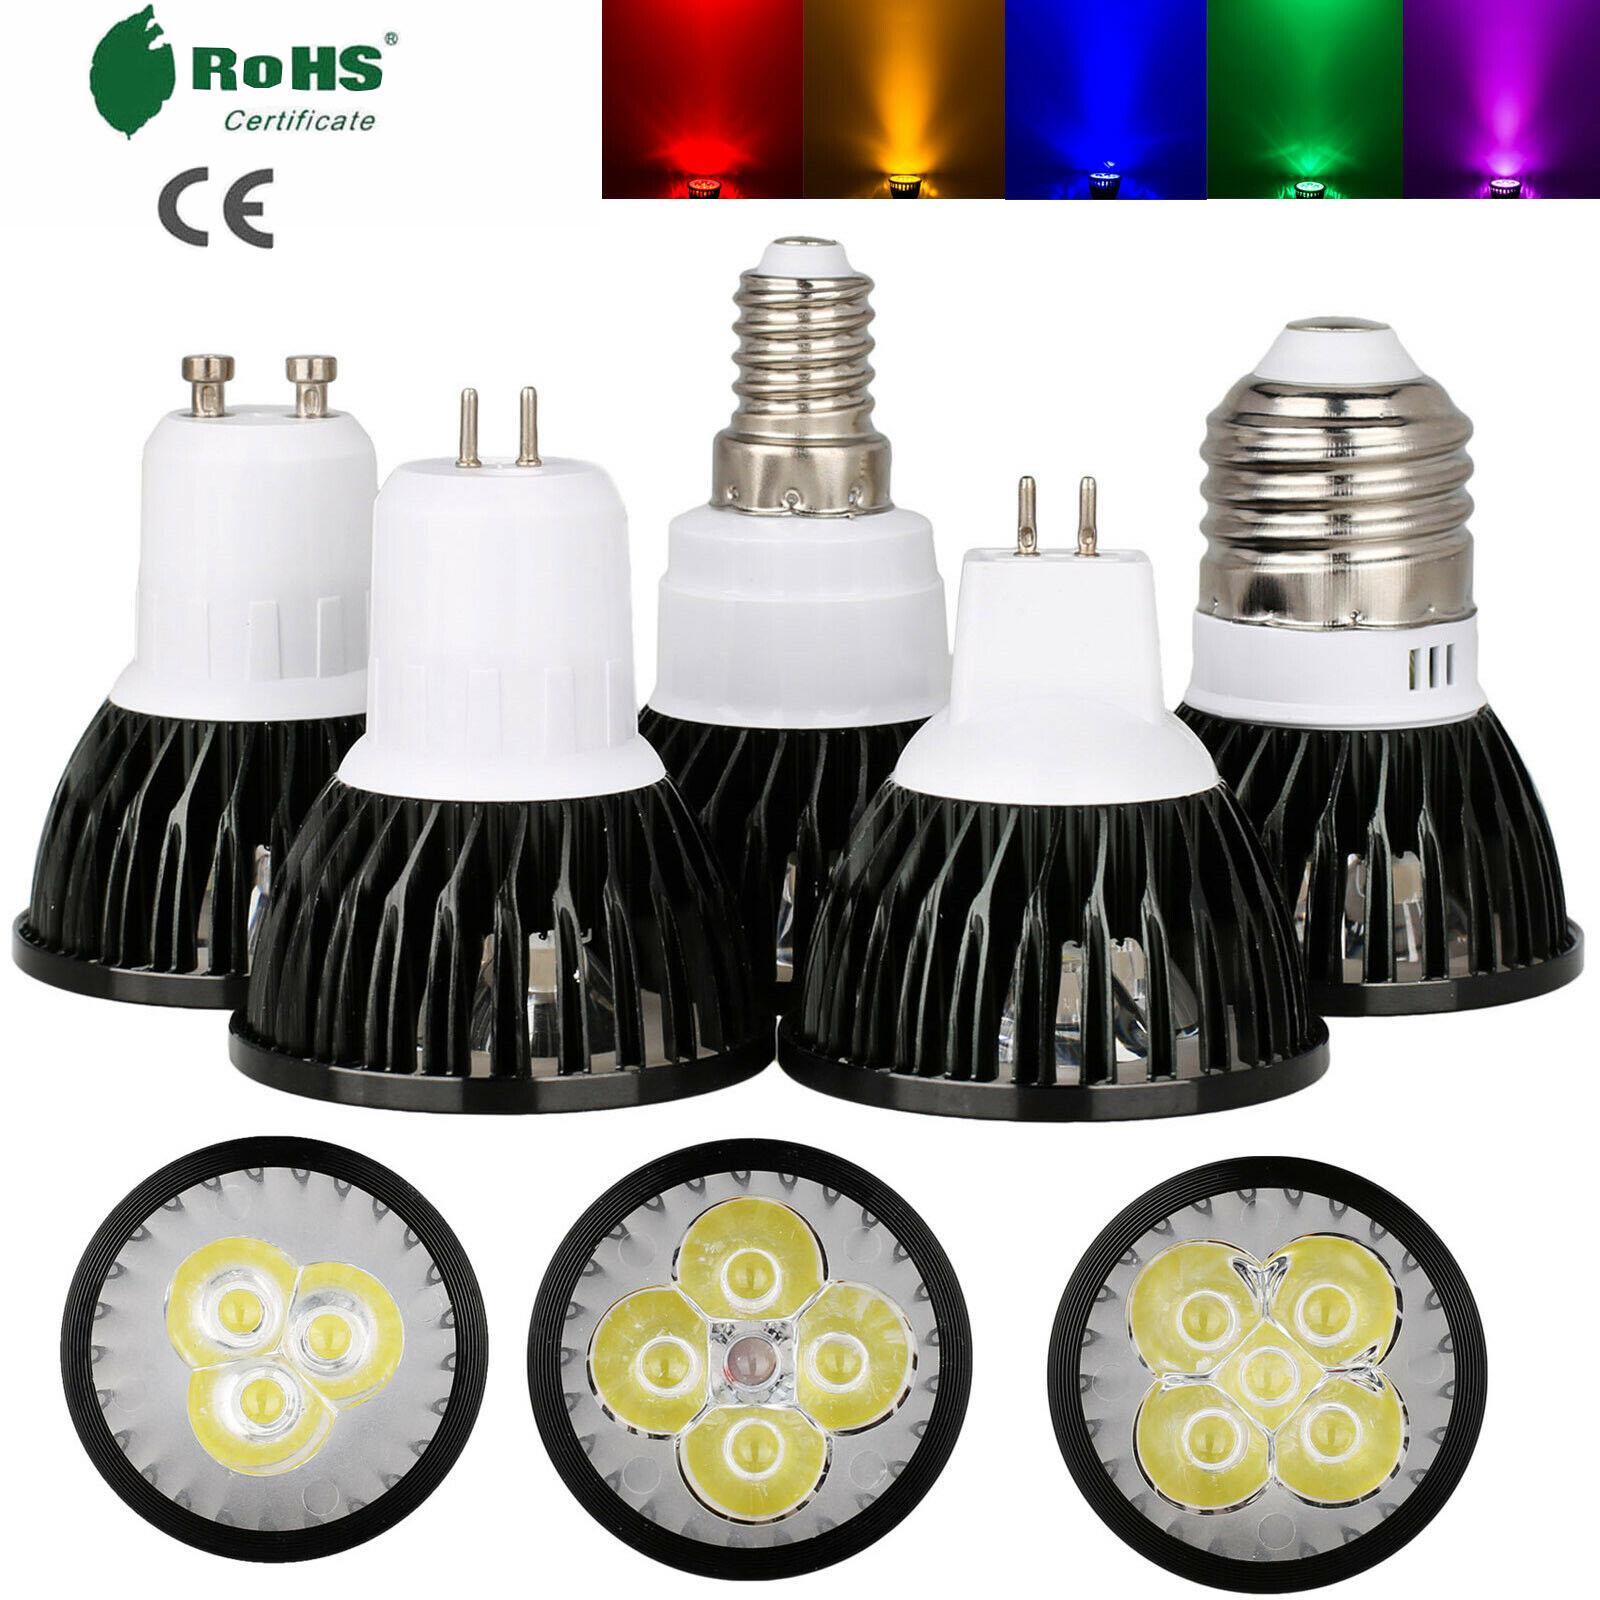 Red Yellow Blue Green LED Bulb Spotlight GU10 MR17 GU5.3 E27 E12 Bright Lamp 110V 220V 12V For Home Office Decoration Lampada